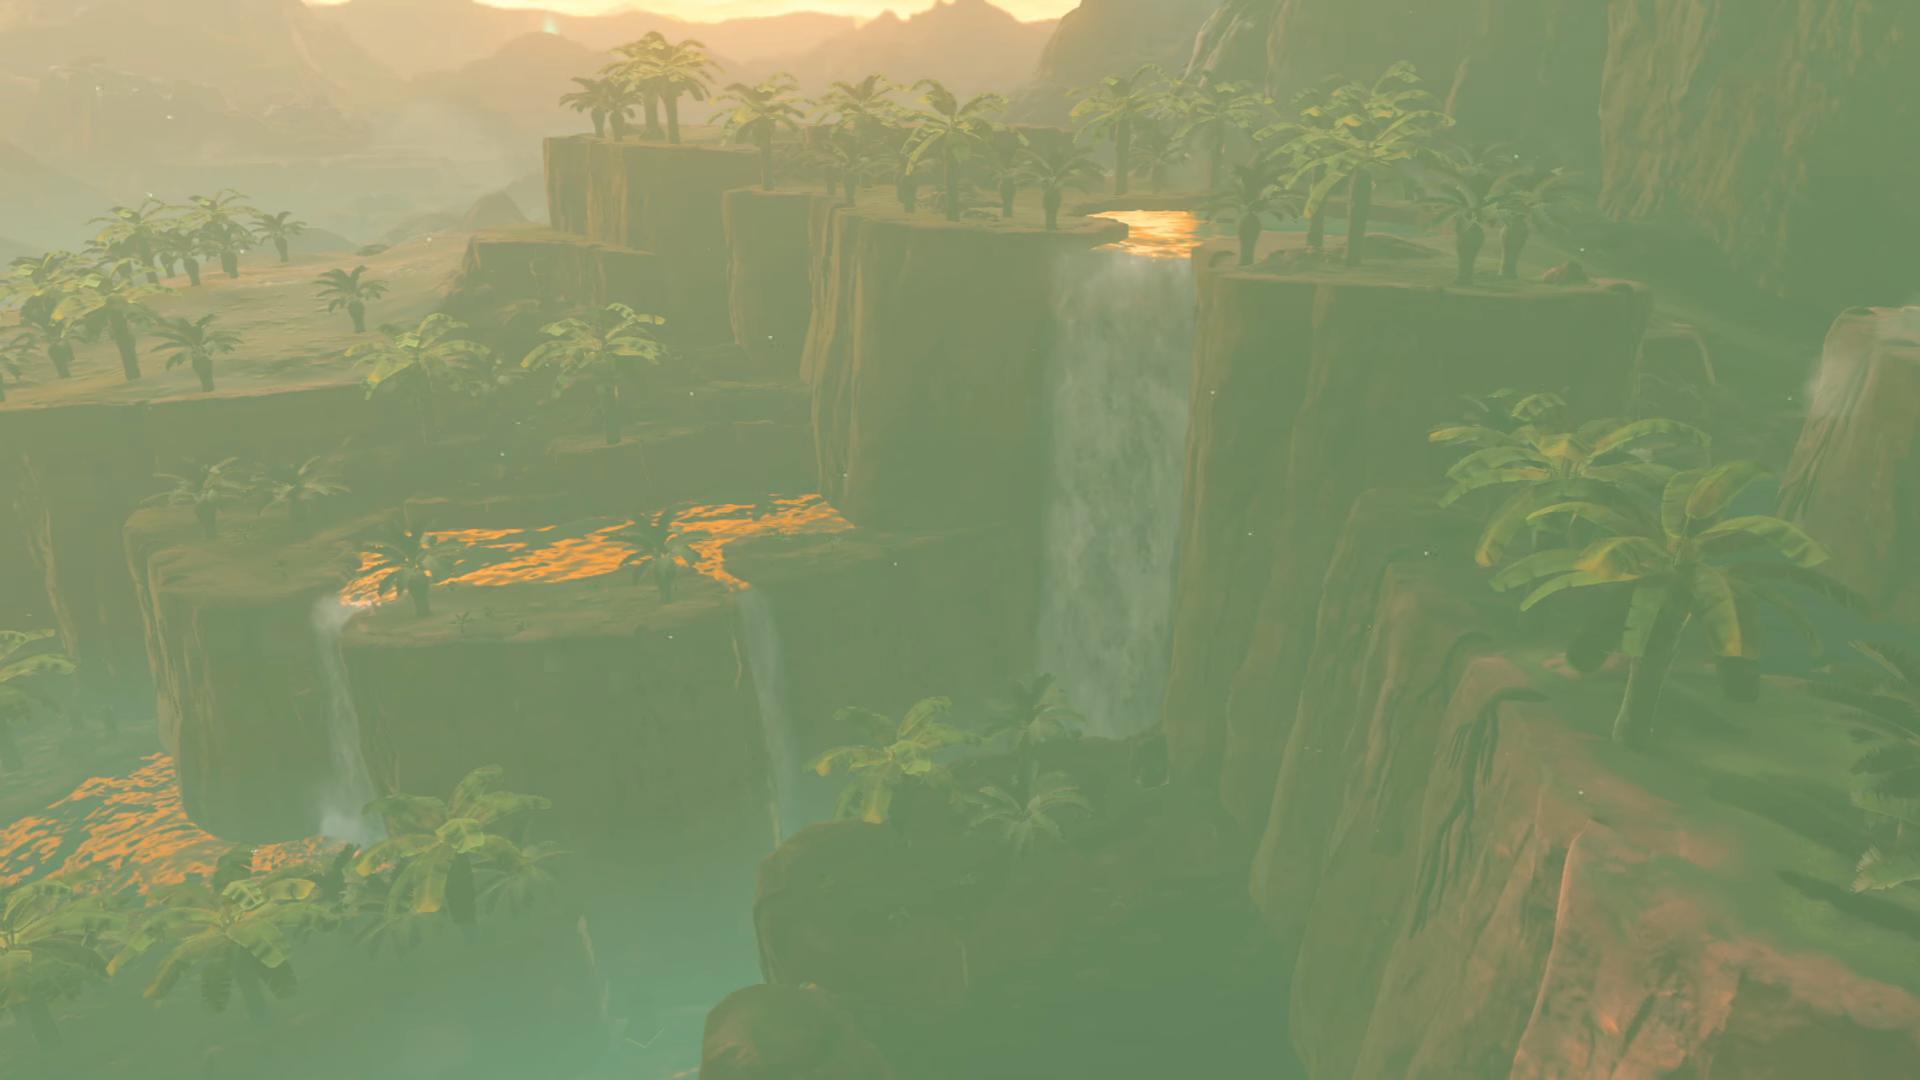 Zelda: Breath of the Wild Comparison Screenshot 3